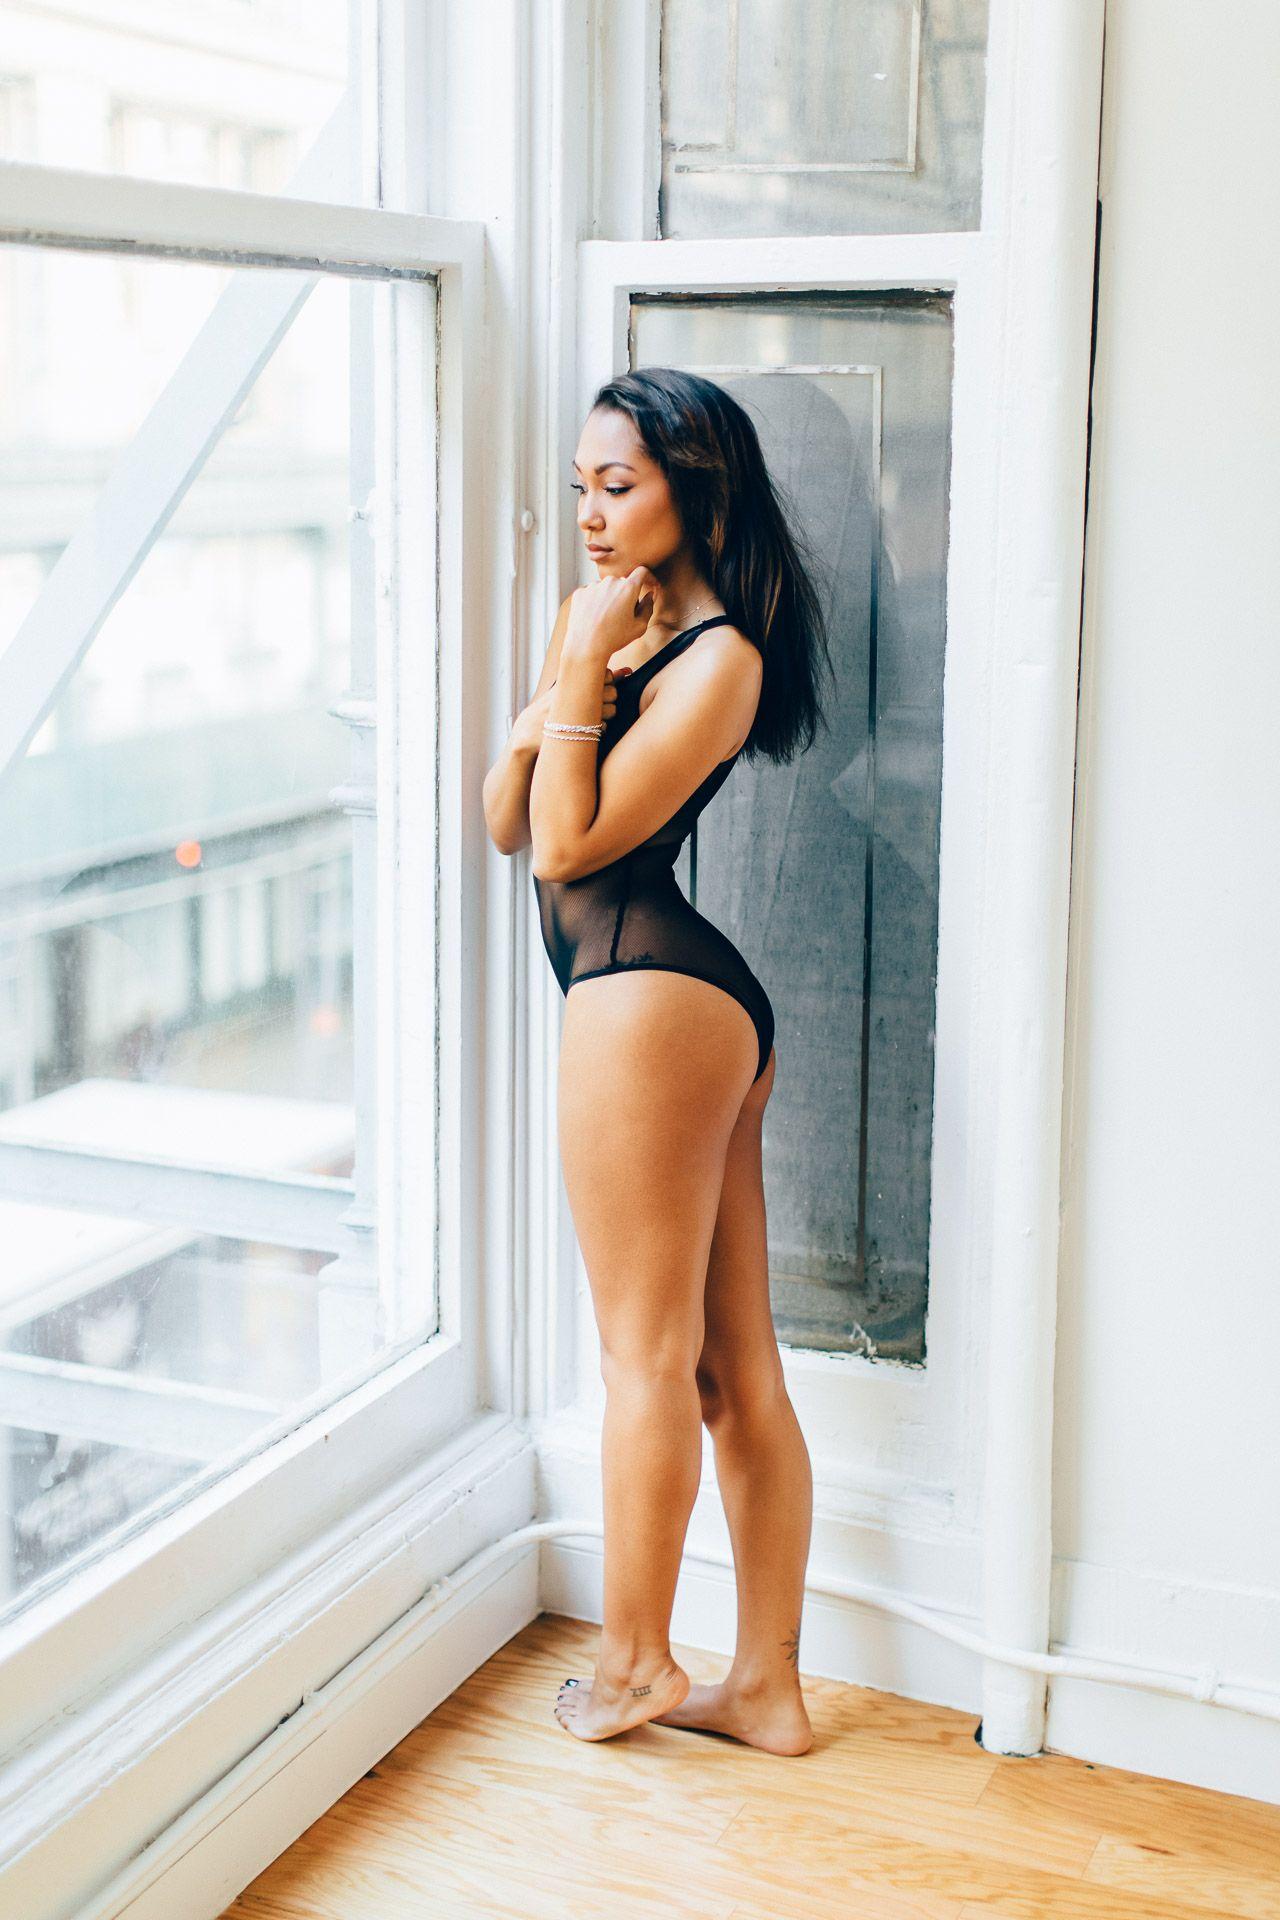 Feet Jo Parker nude photos 2019